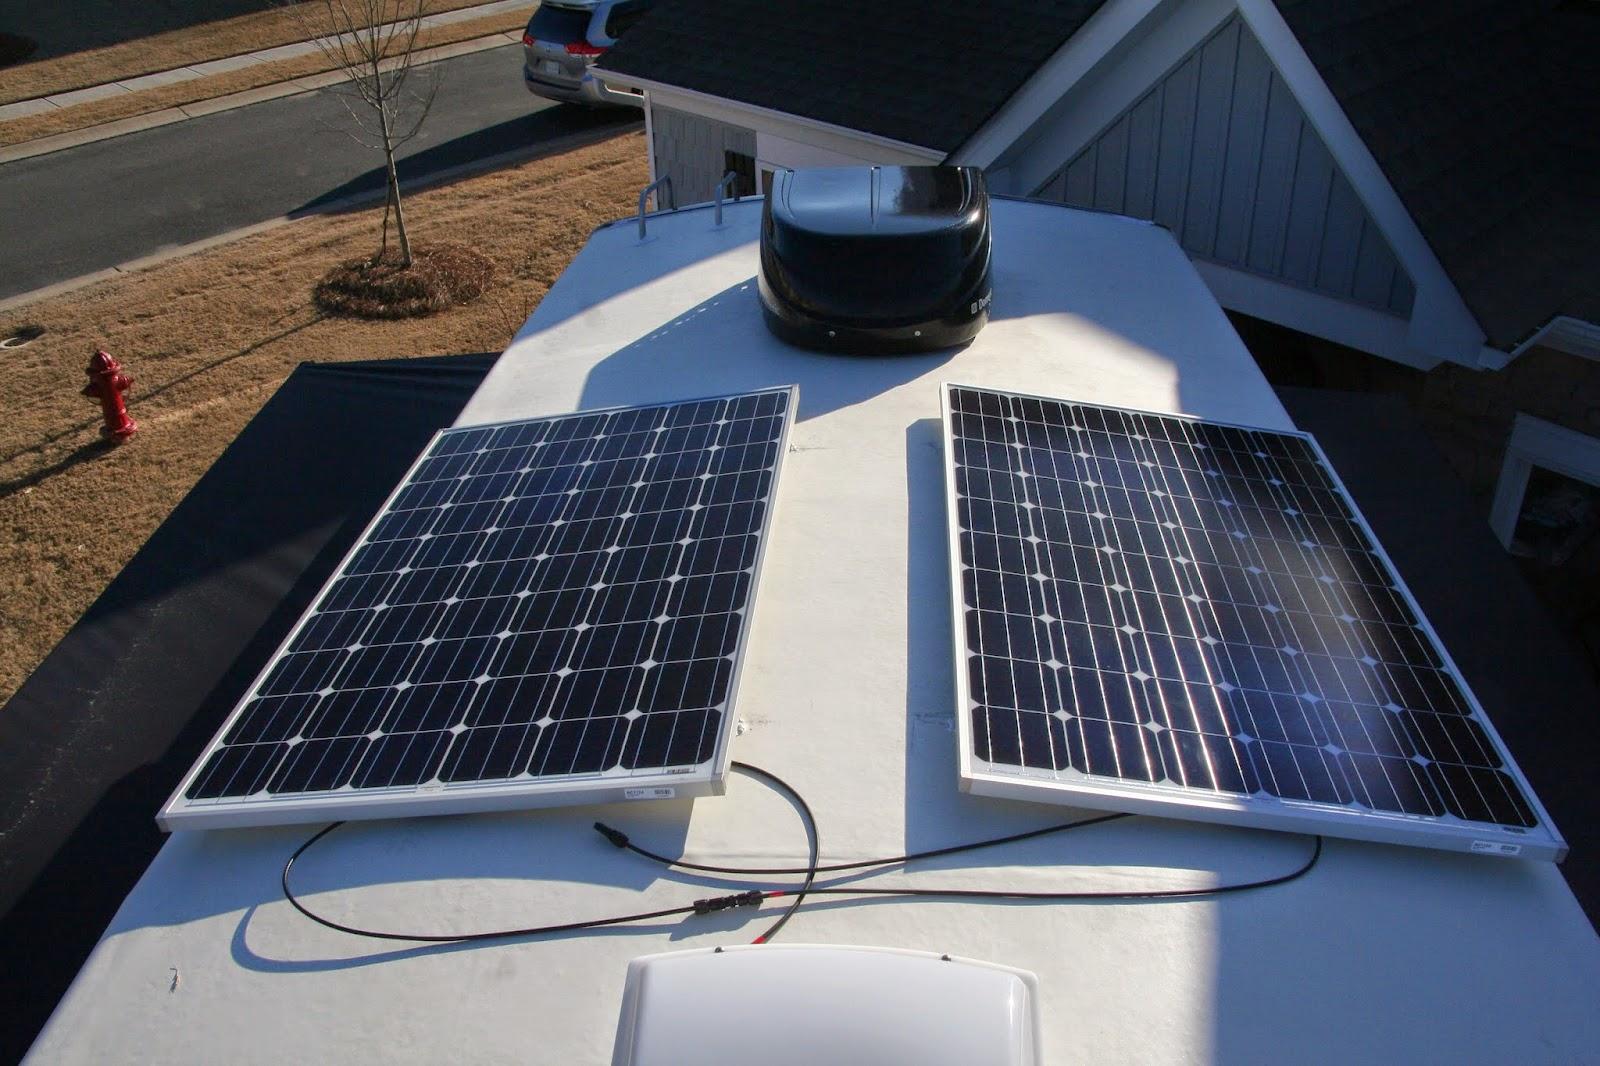 2015 Montana 3611rl Installing Solar Panels Automatic Wiring Diagram